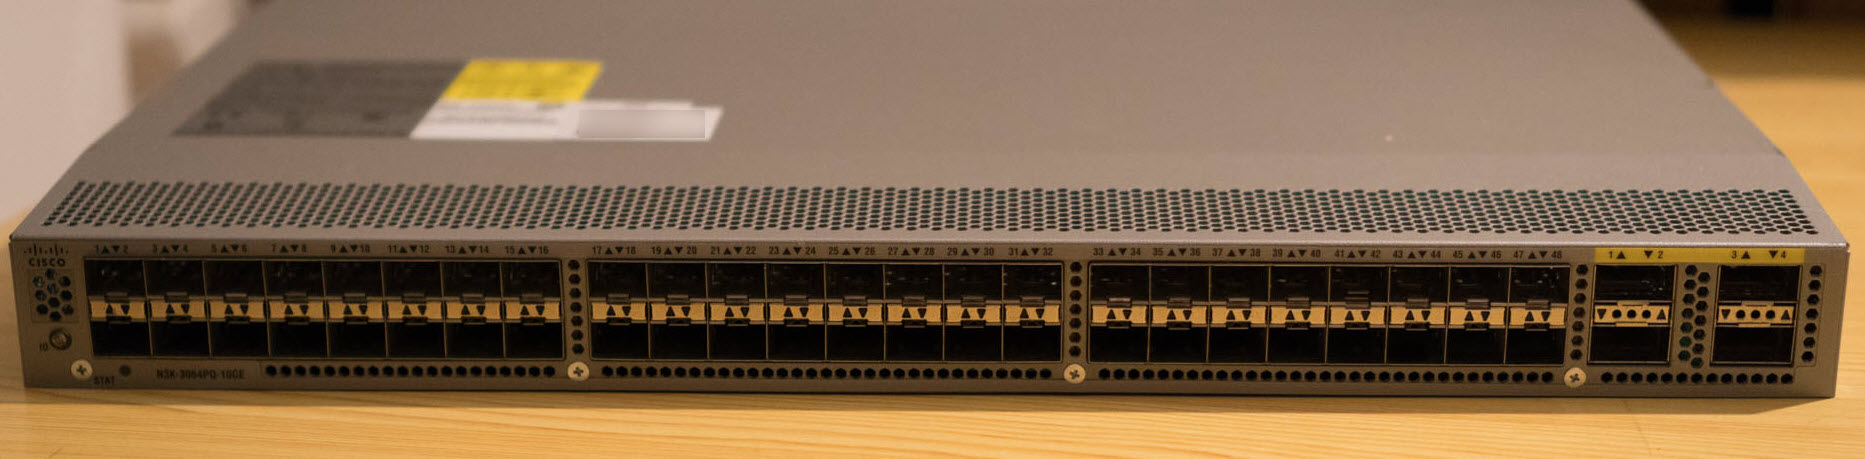 Cisco Nexus 3064PQ-10GE (48x SFP+ & 4x QSFP+)